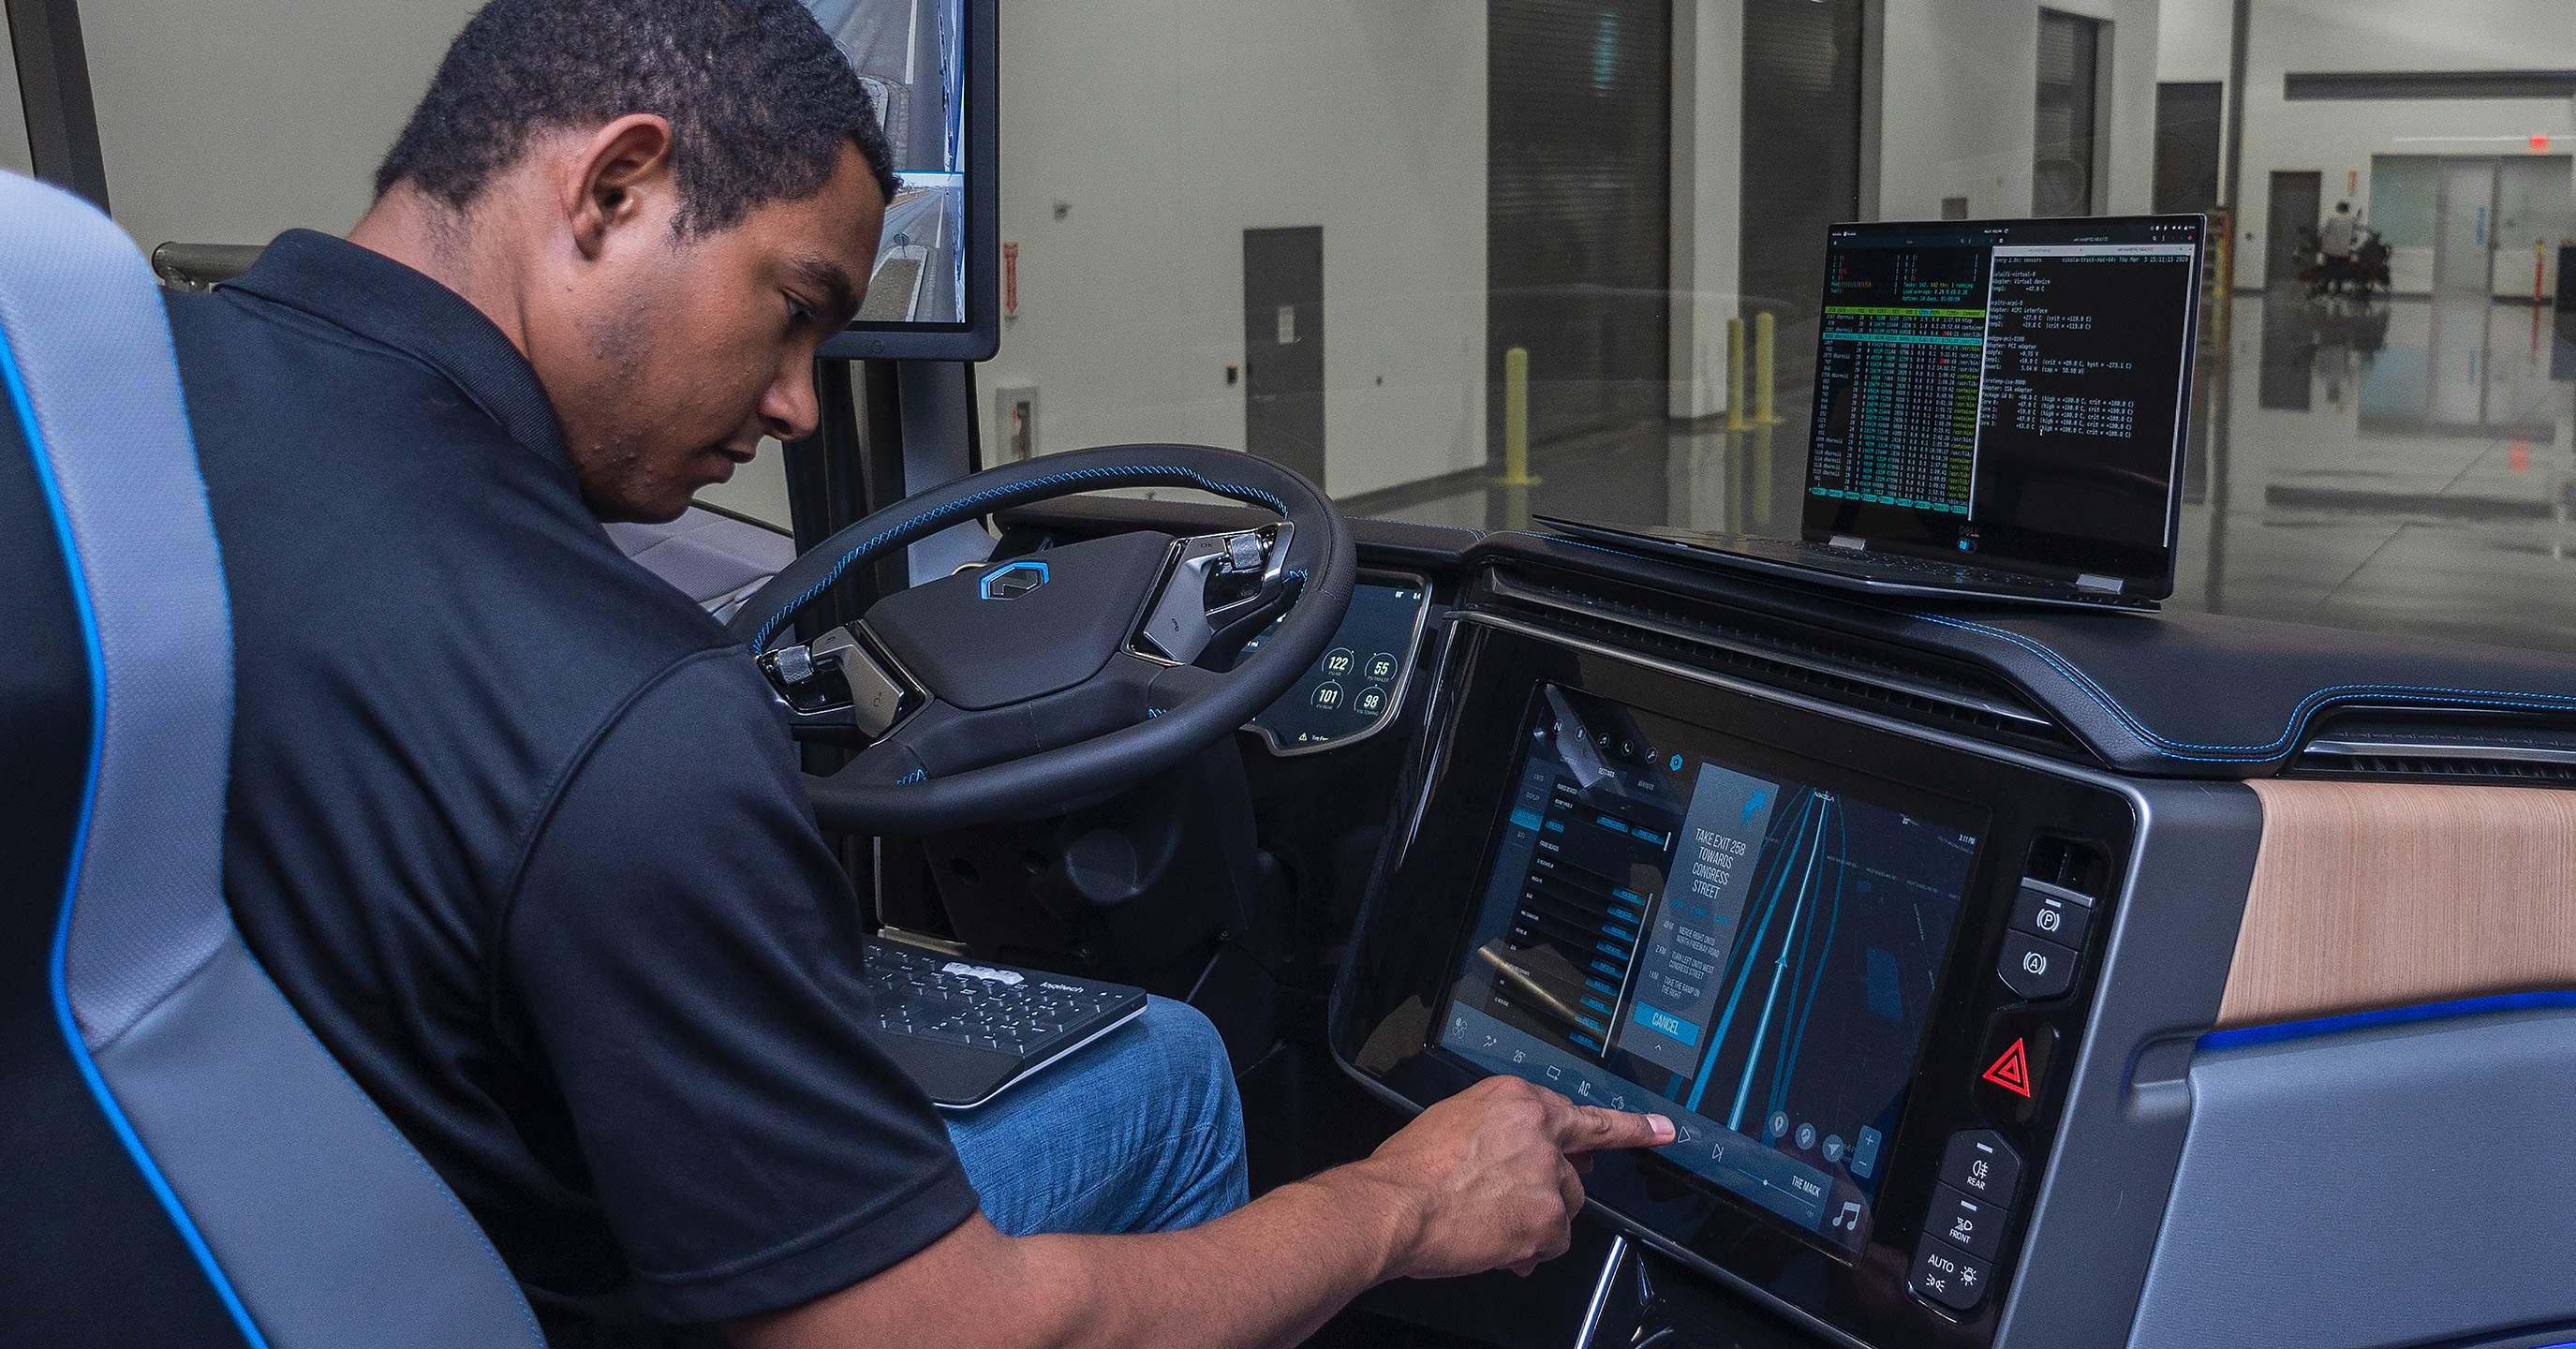 Nikola vehicle tech jobs